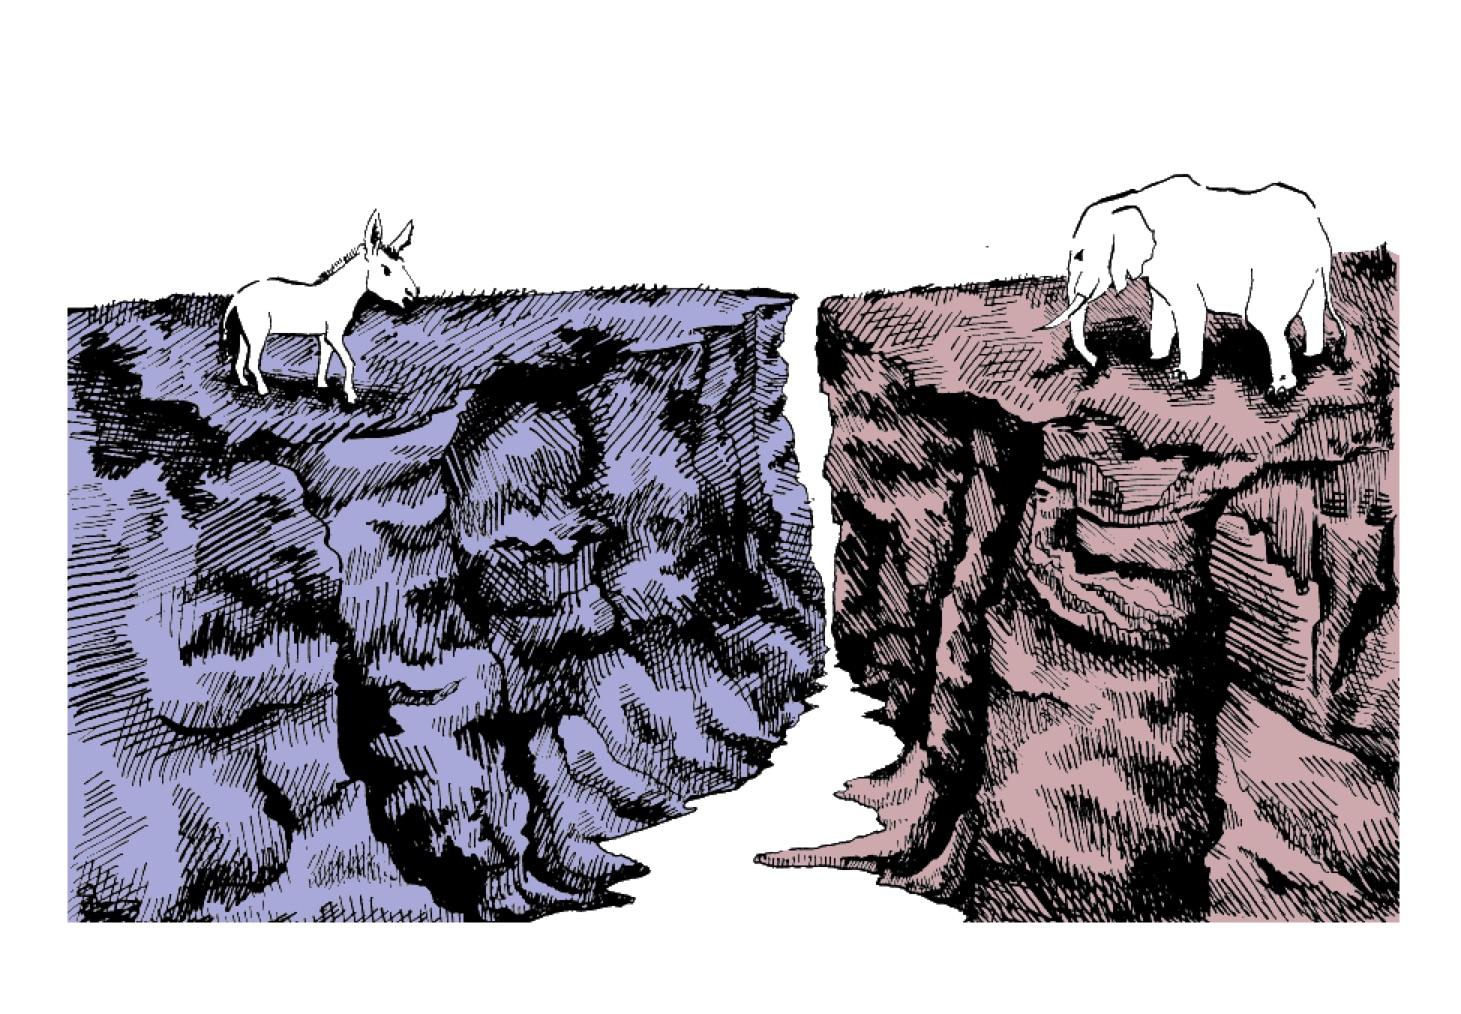 Illustration by Haley Triem